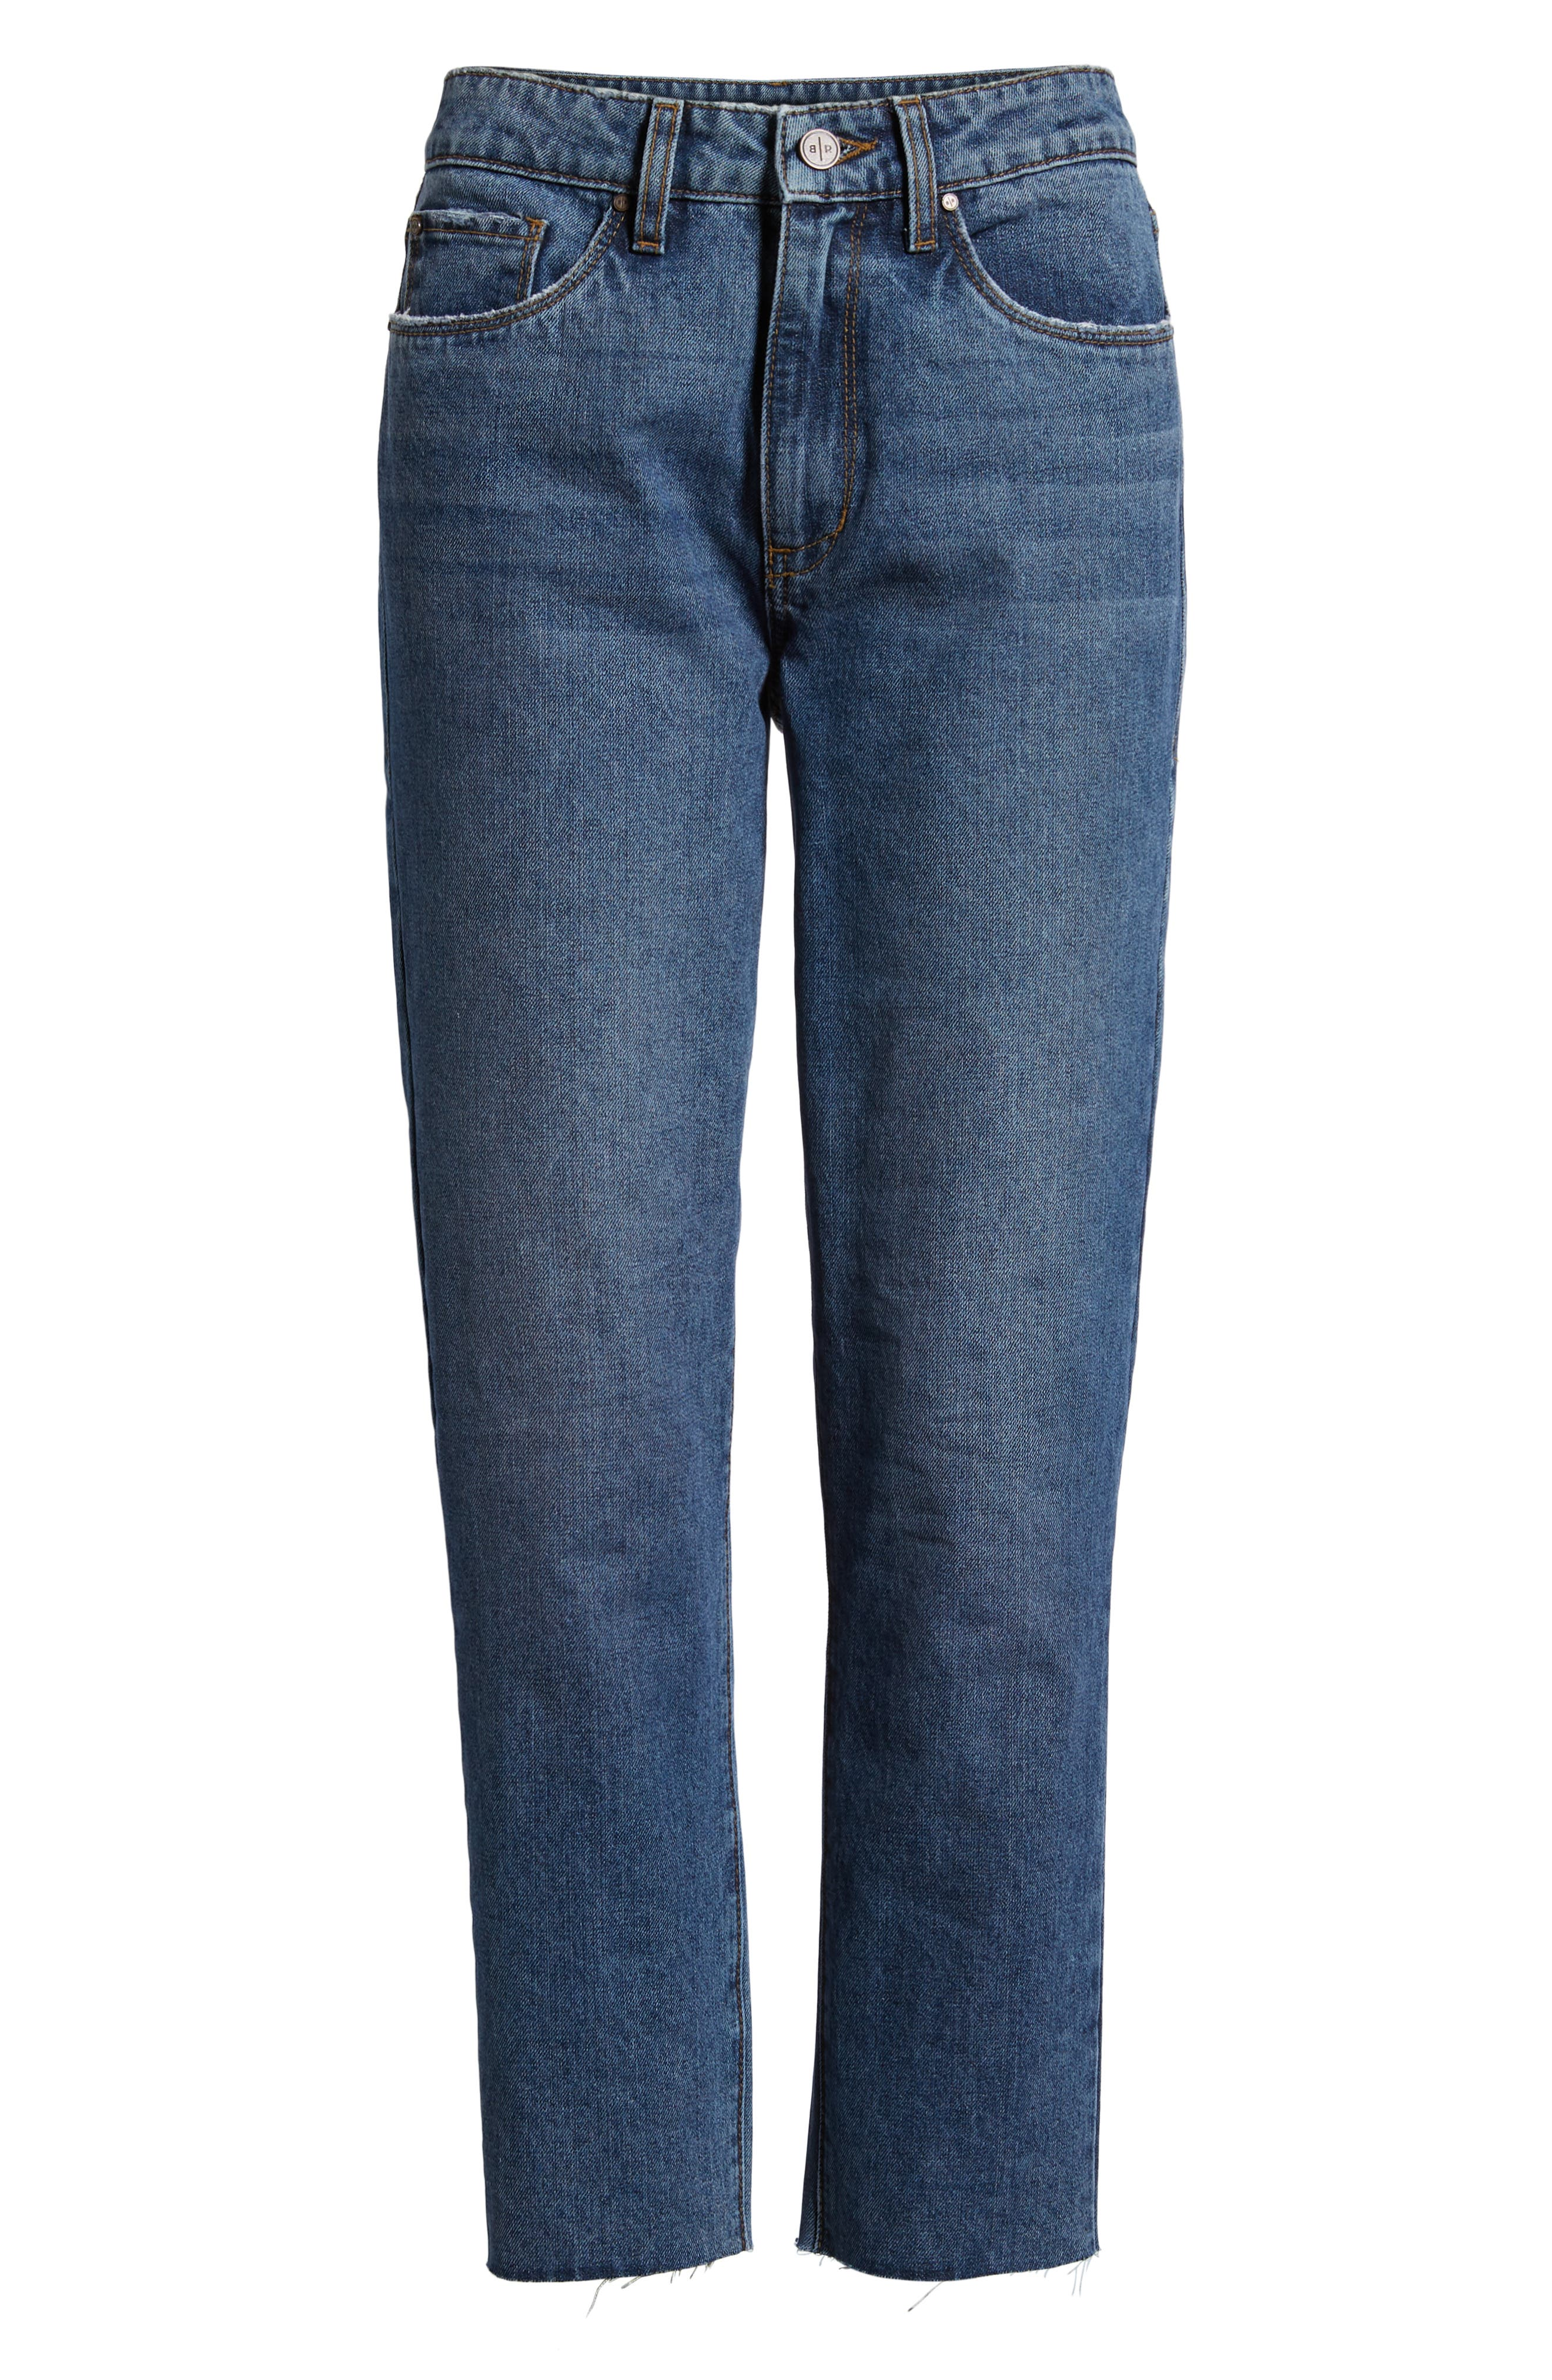 High Waist Straight Leg Crop Jeans,                             Alternate thumbnail 7, color,                             401